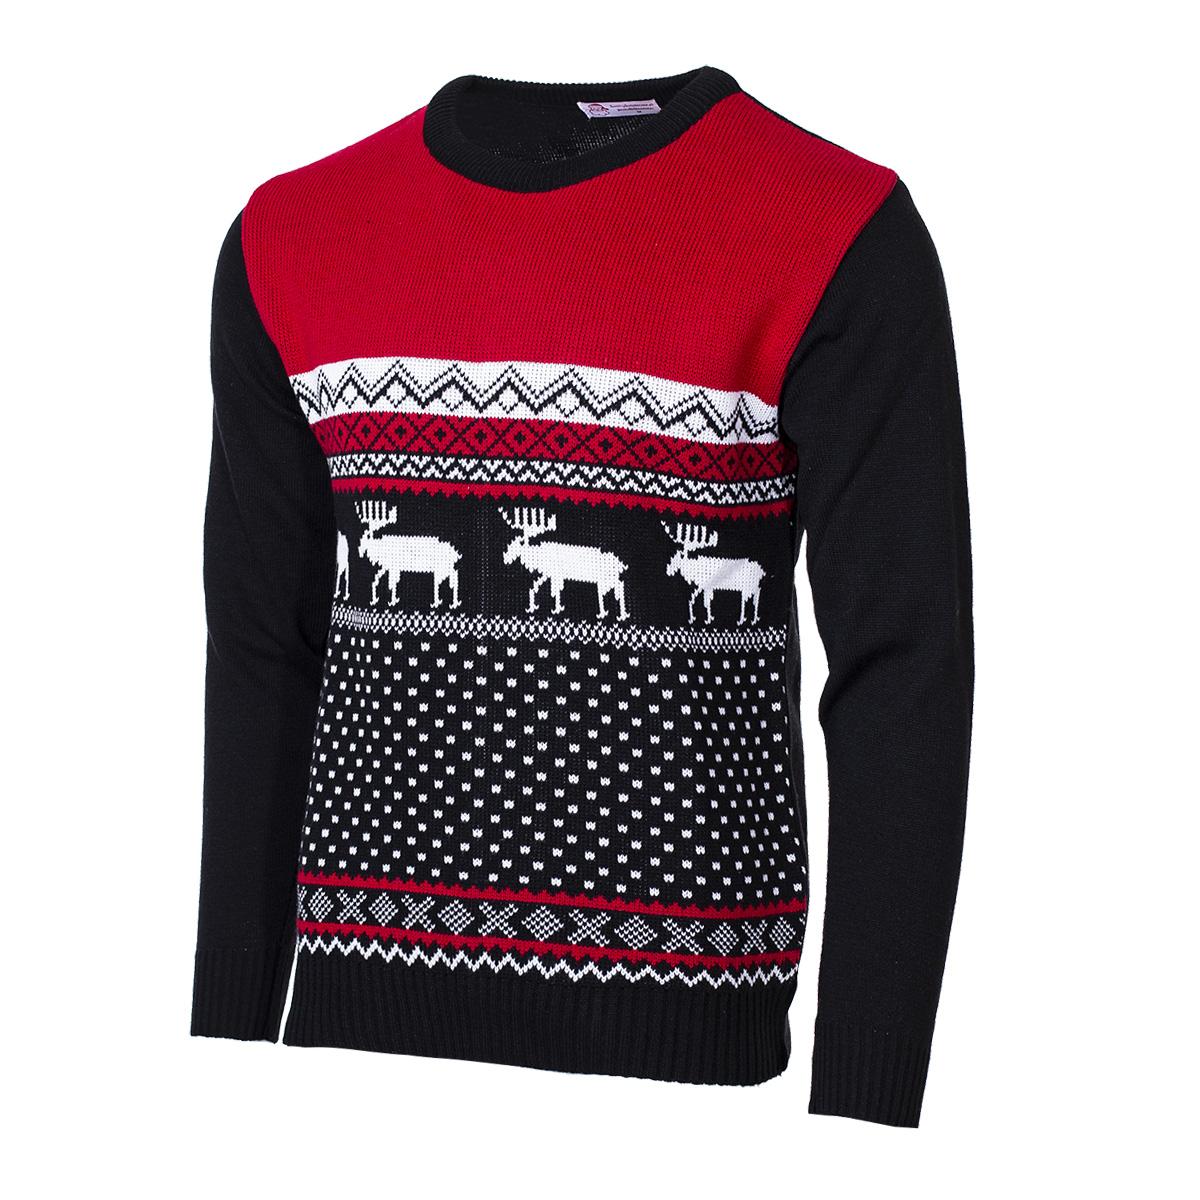 Pánský svetr se sobem Marching Reindeer červený S